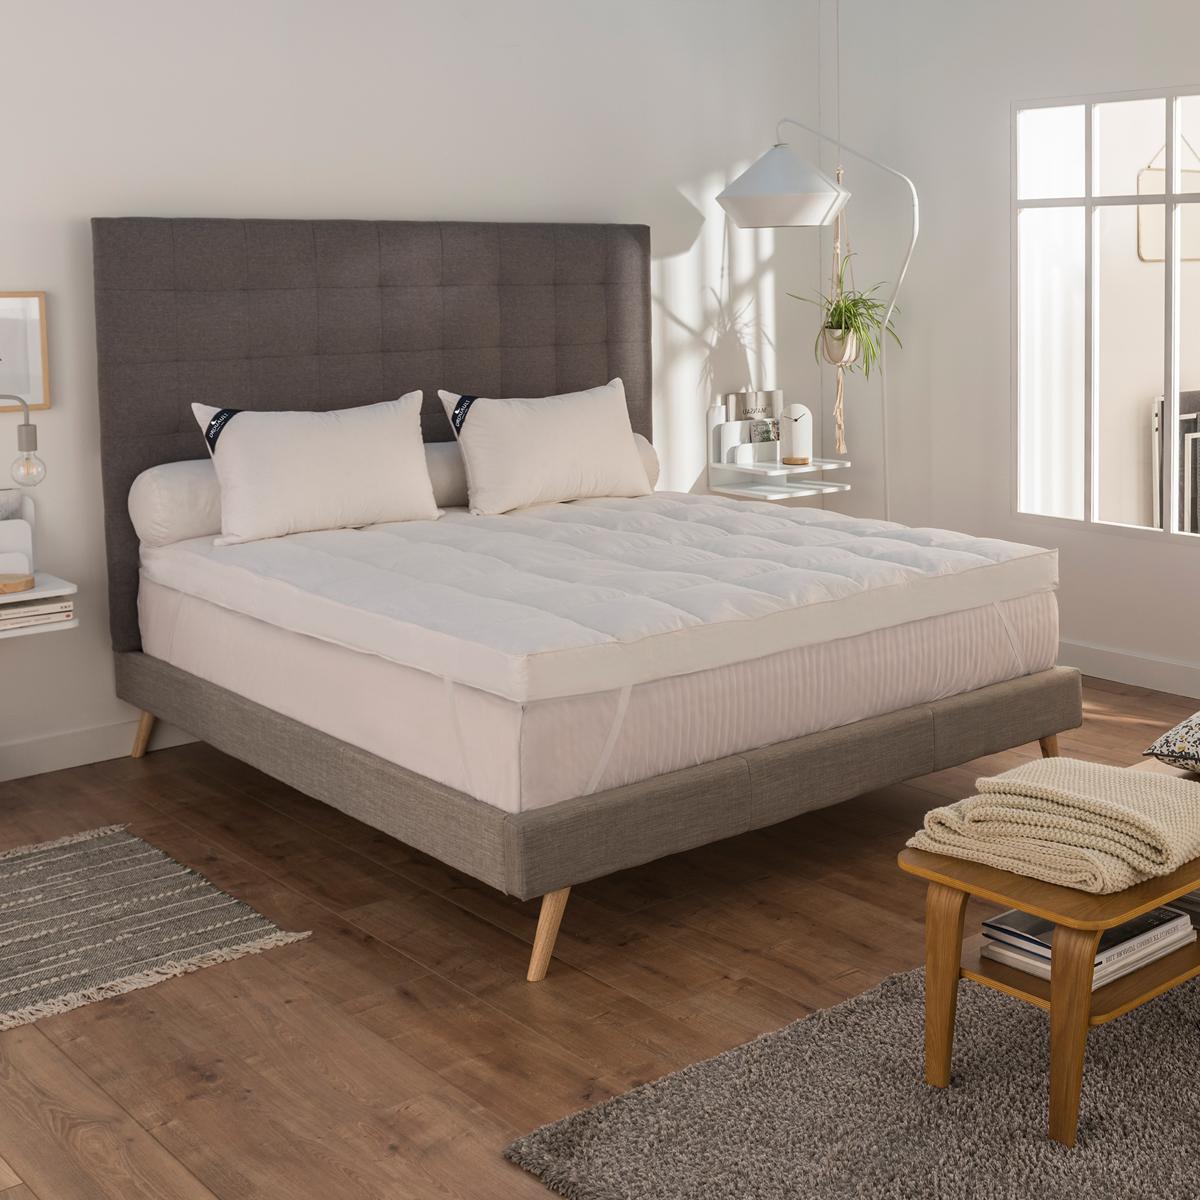 Surconfort de Matelas Haut Luxe Pro 140x190 cm